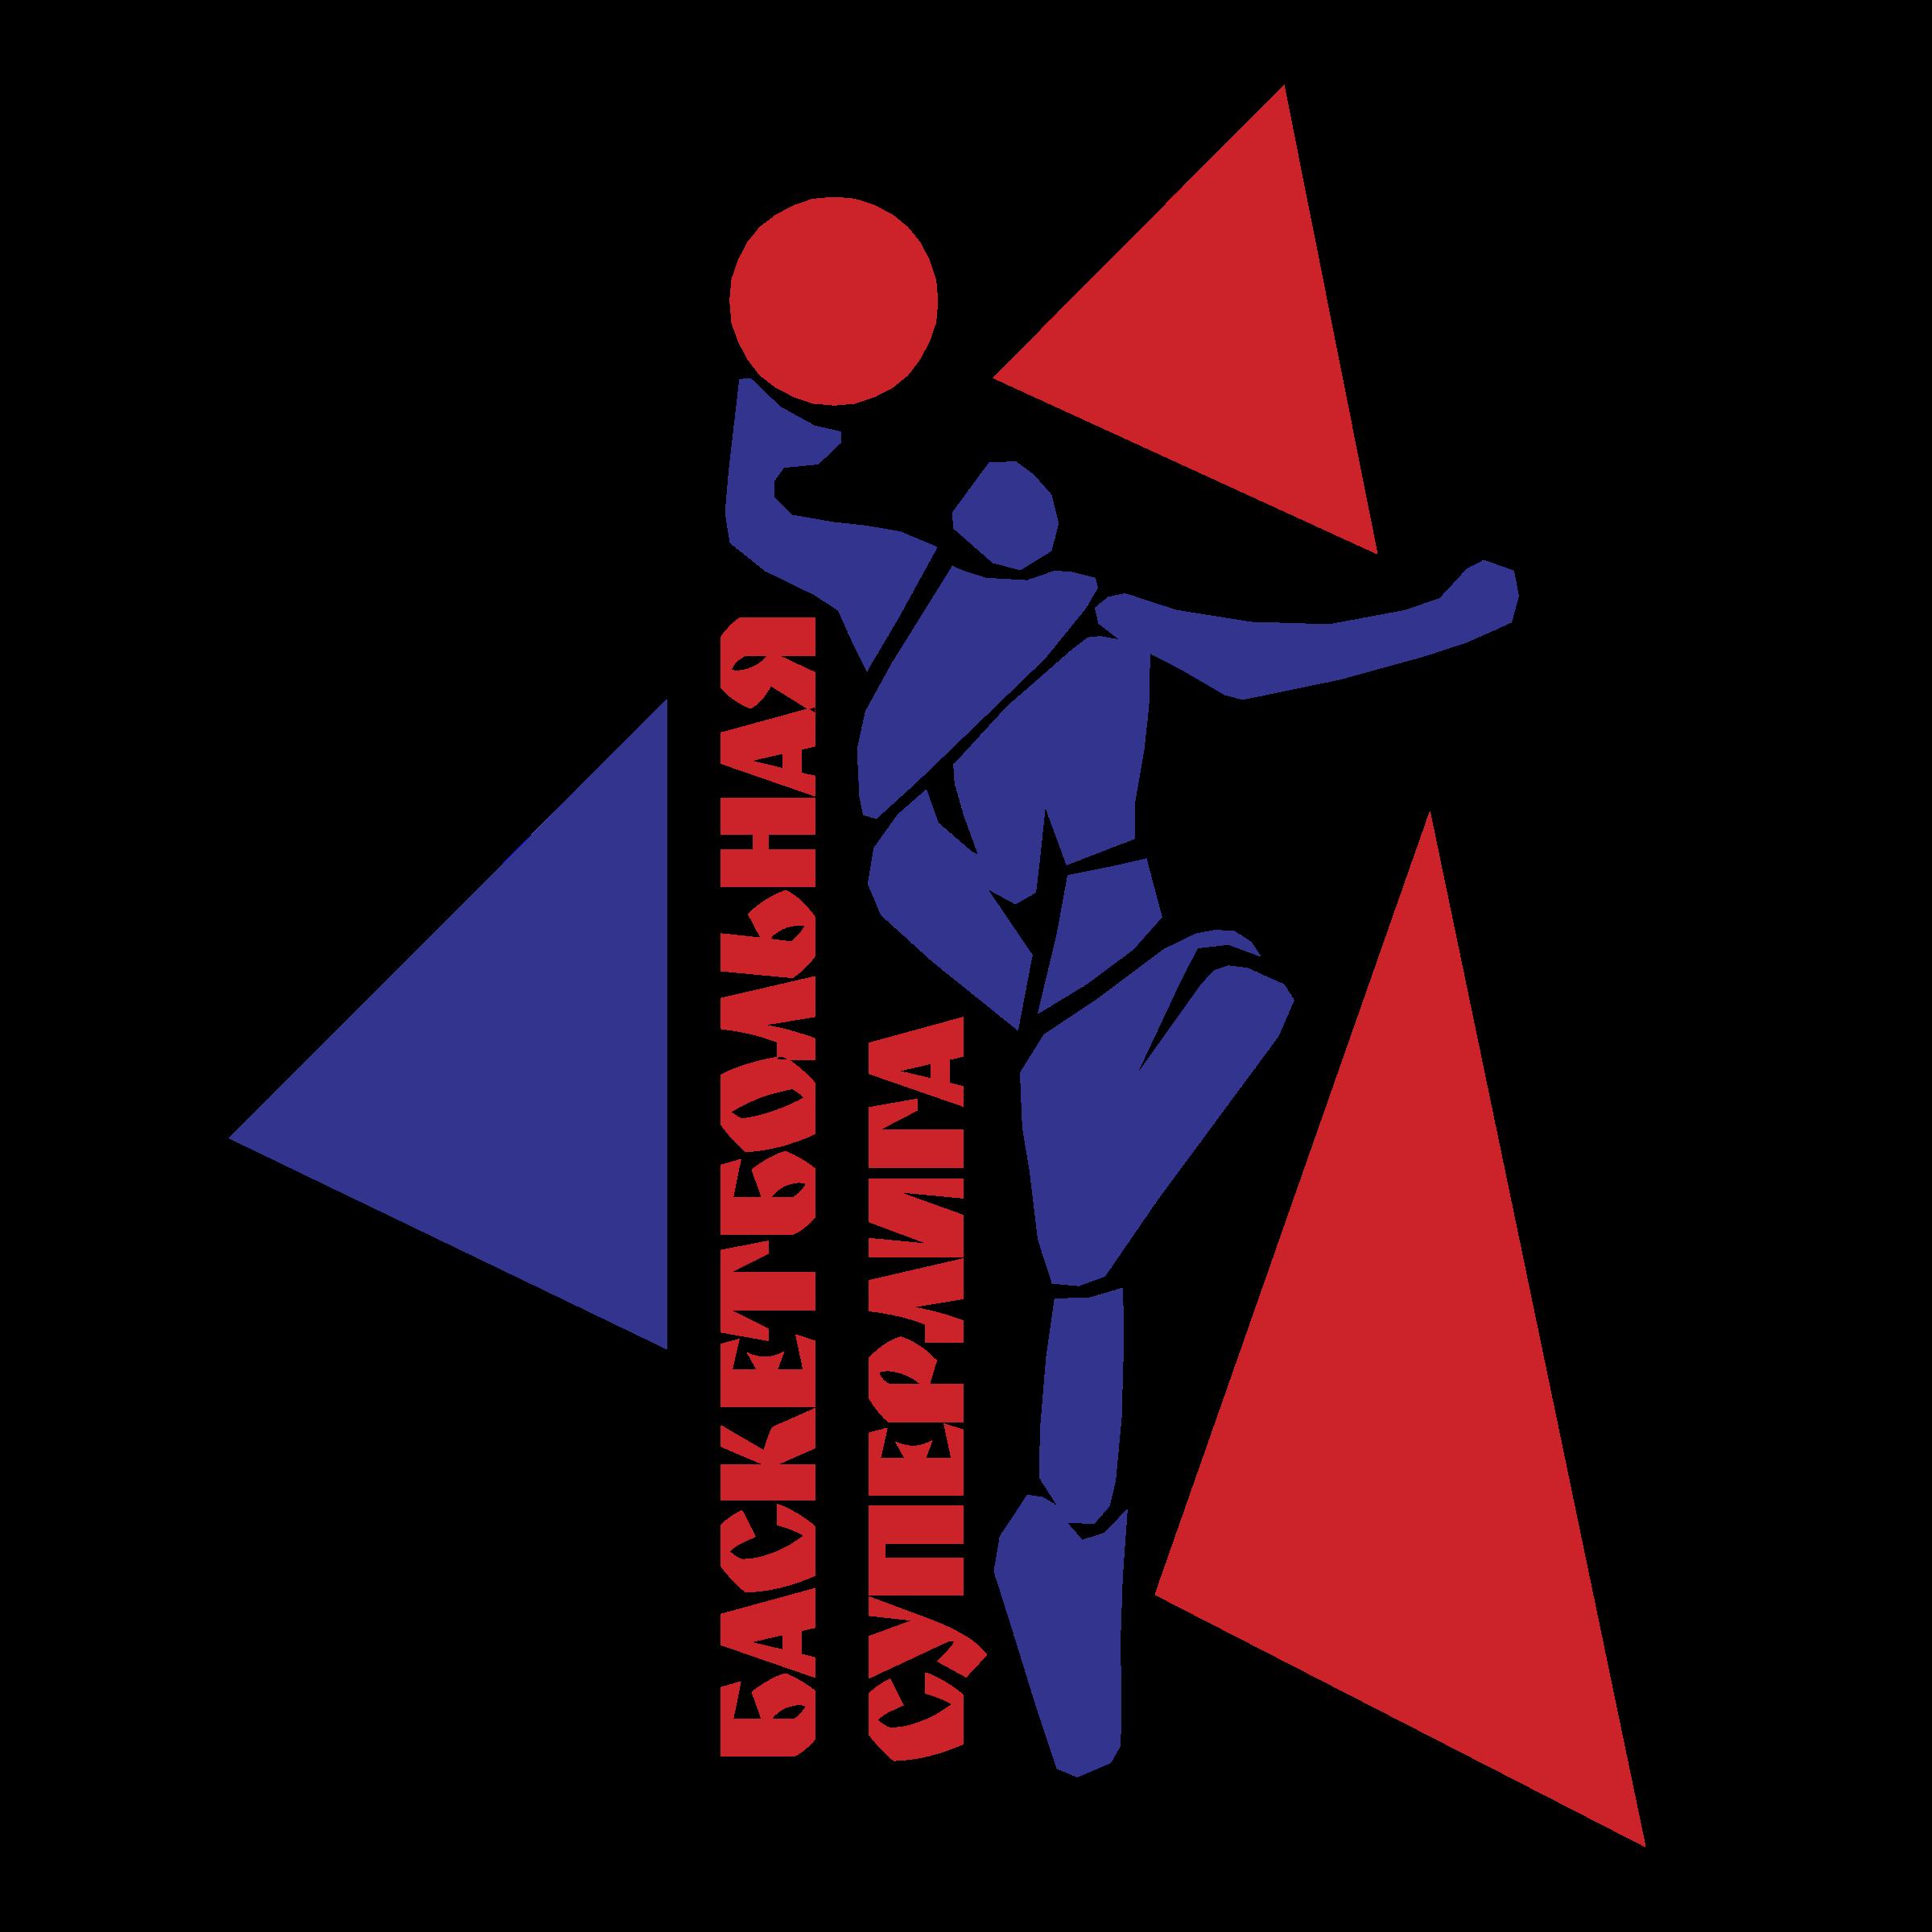 Basketball Superleague Logo PNG Transparent & SVG Vector ...